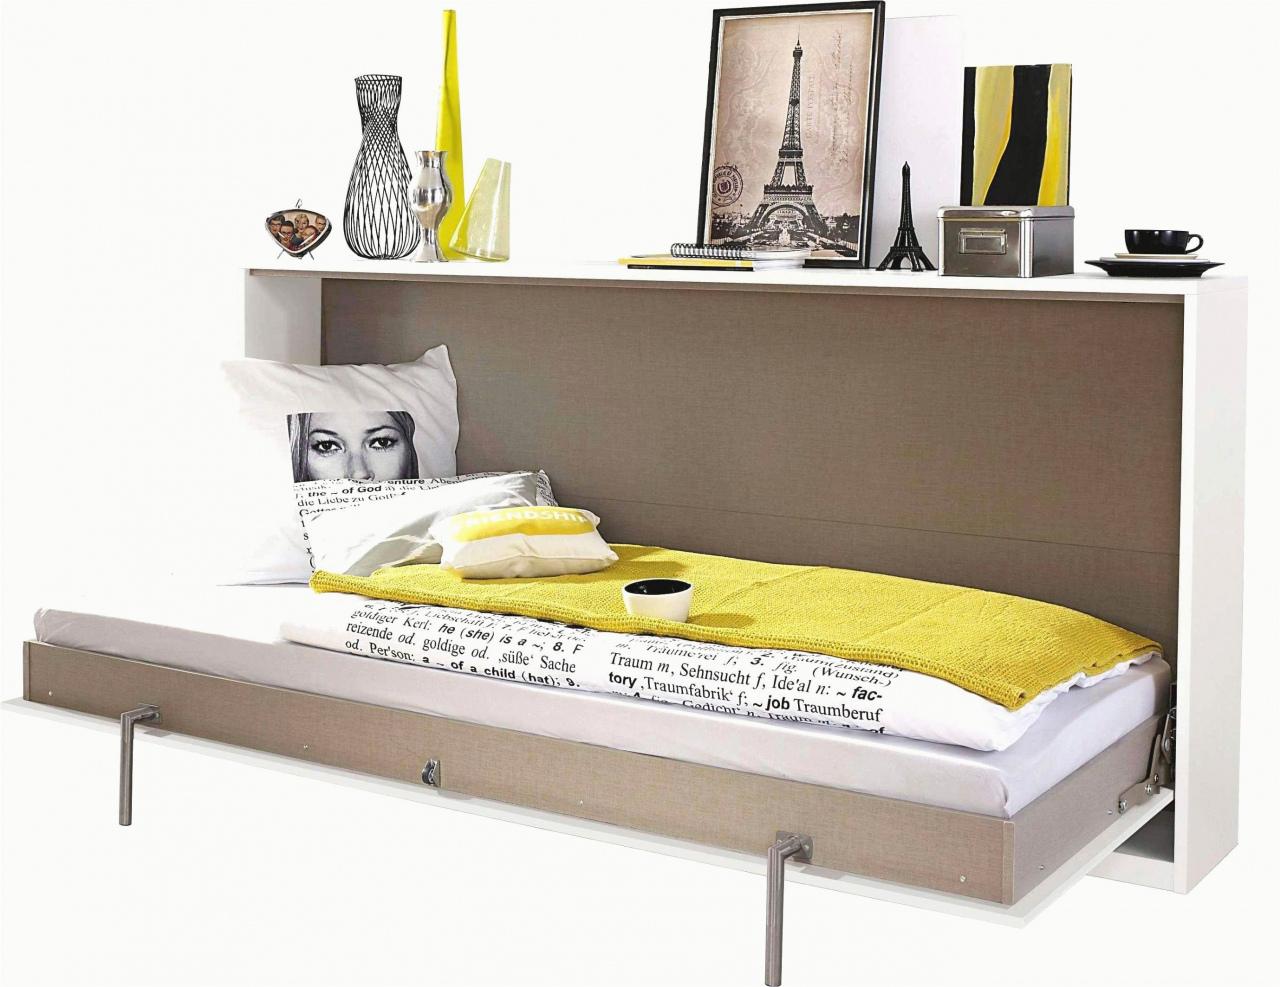 diy bed frame with drawers diy platform bed with drawers ikea 38 neu kuche eiche weis kitchen durch diy bed frame with drawers